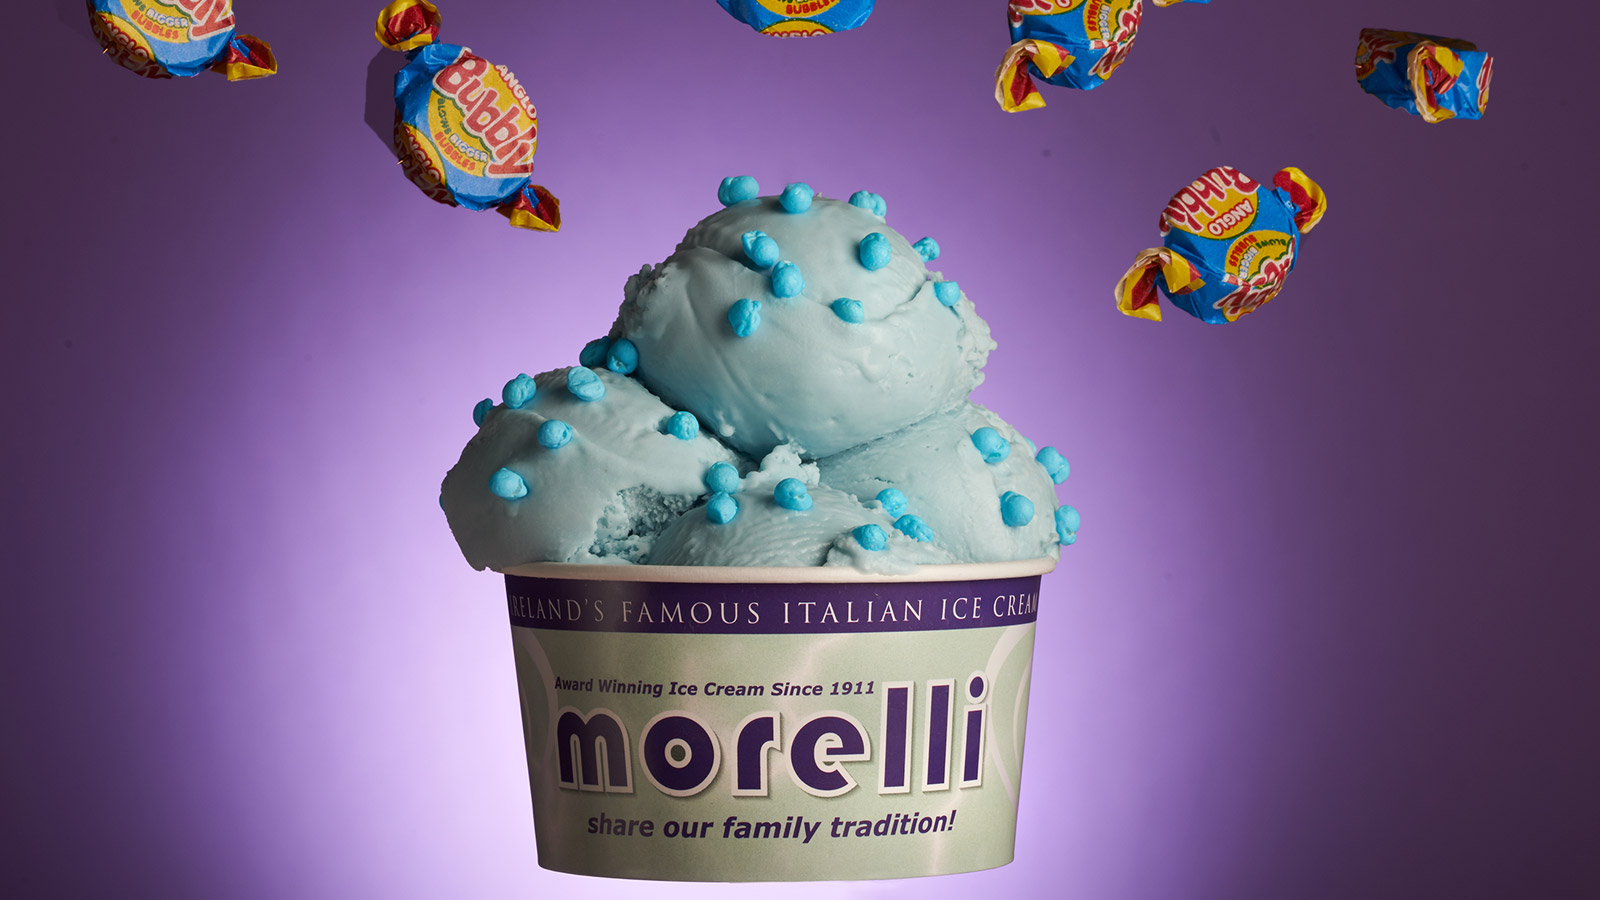 Morelli Ice Cream Ireland S Famous Italian Ice Cream